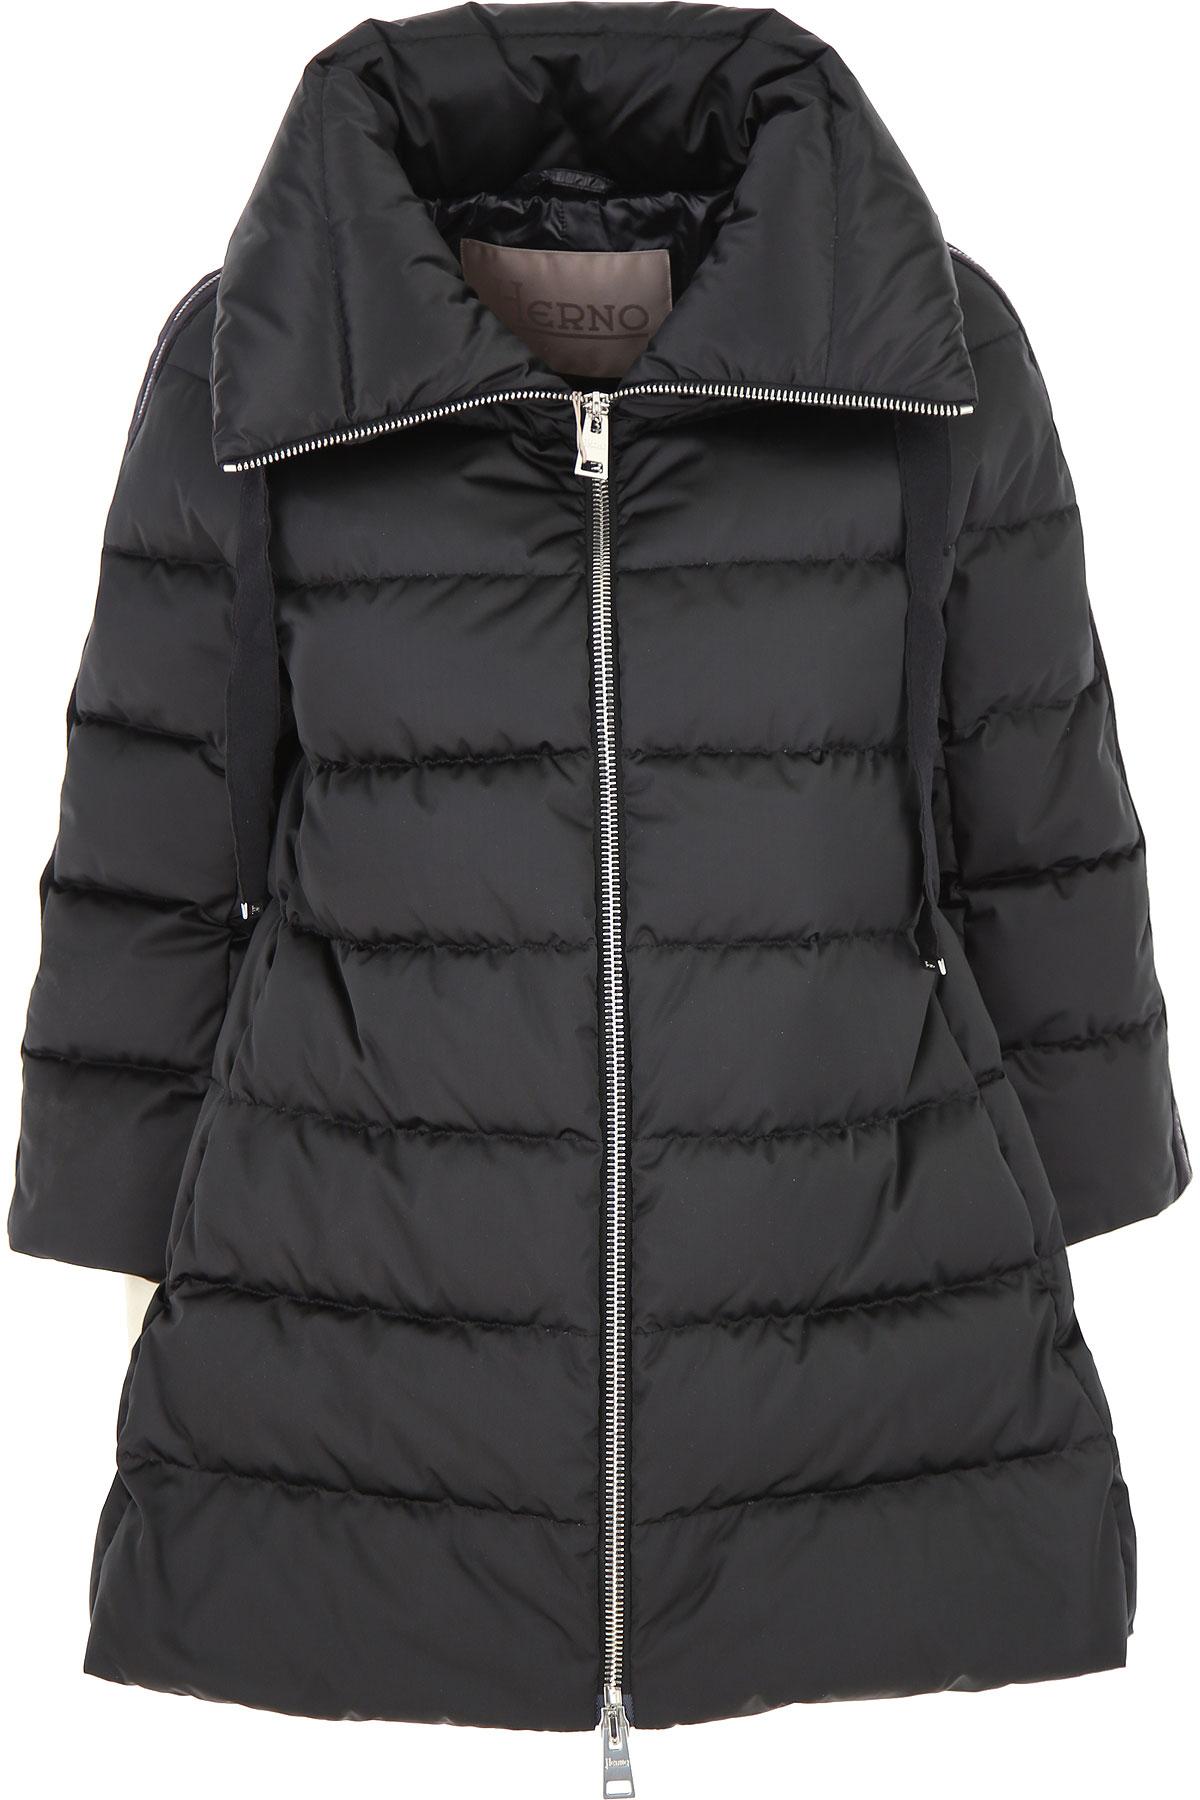 Herno Down Jacket for Women, Puffer Ski Jacket On Sale, Black, Down, 2019, 10 12 2 4 6 8